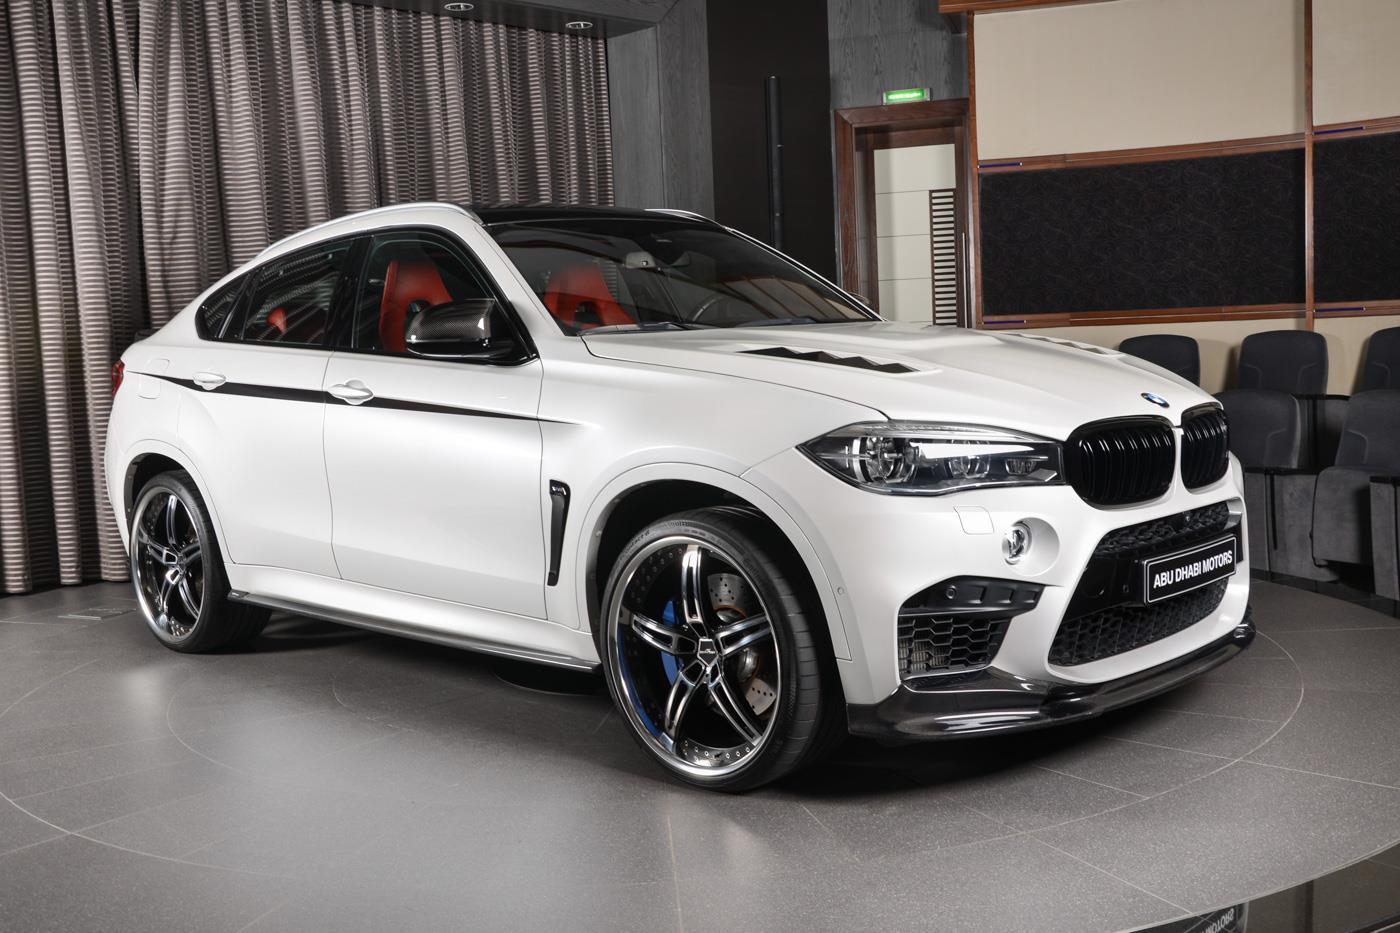 BMW X6 M by 3D Design